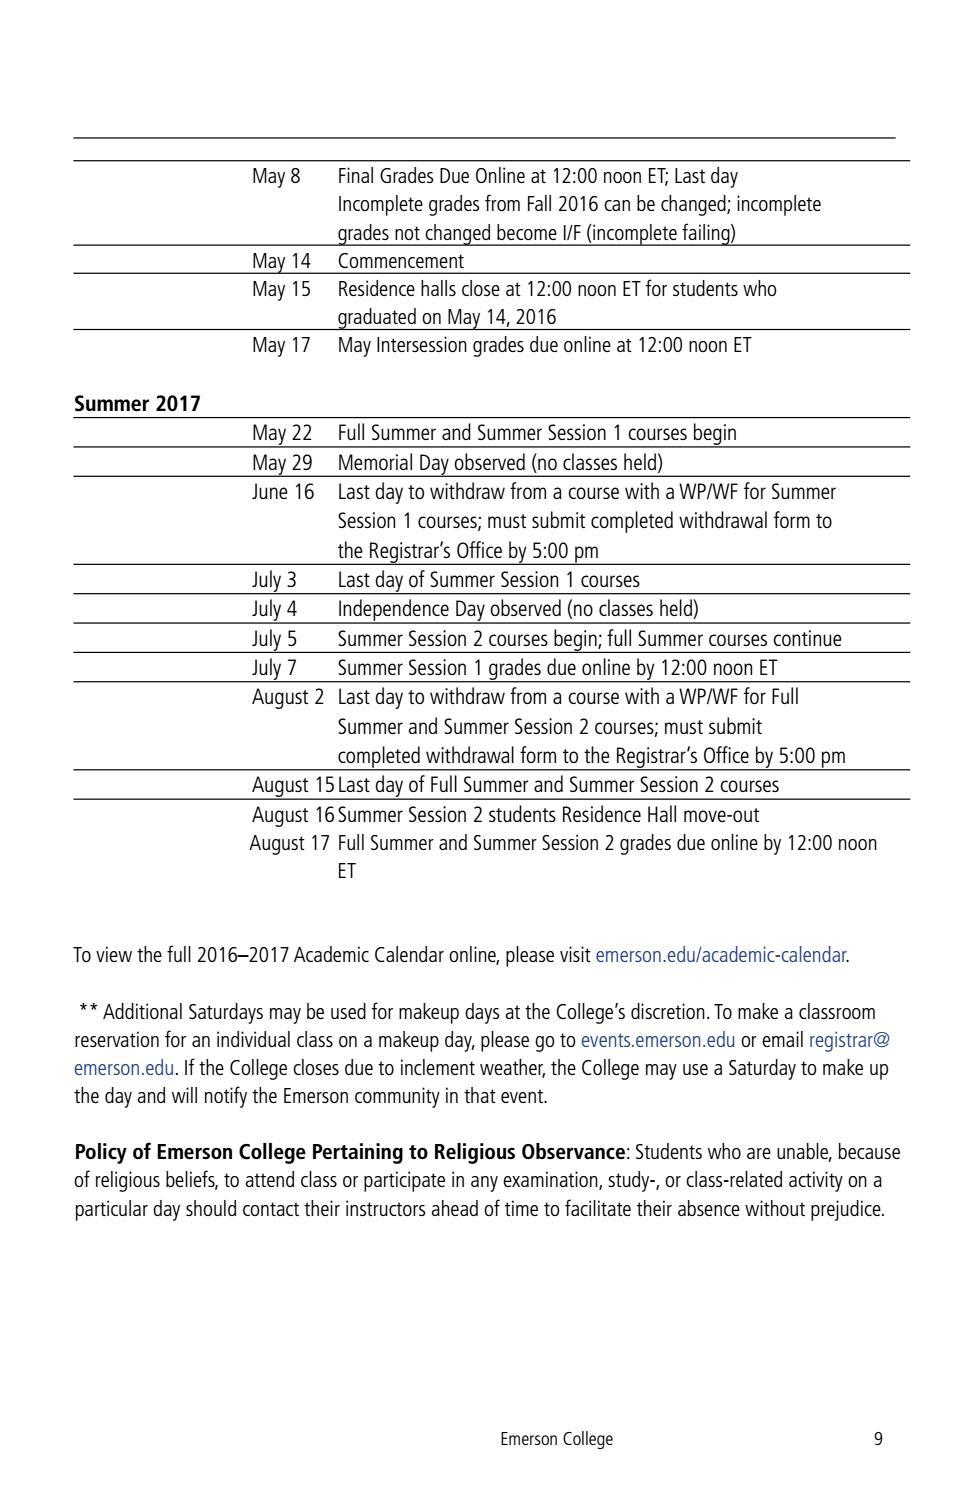 Emerson Academic Calendar | Free Calendar Template